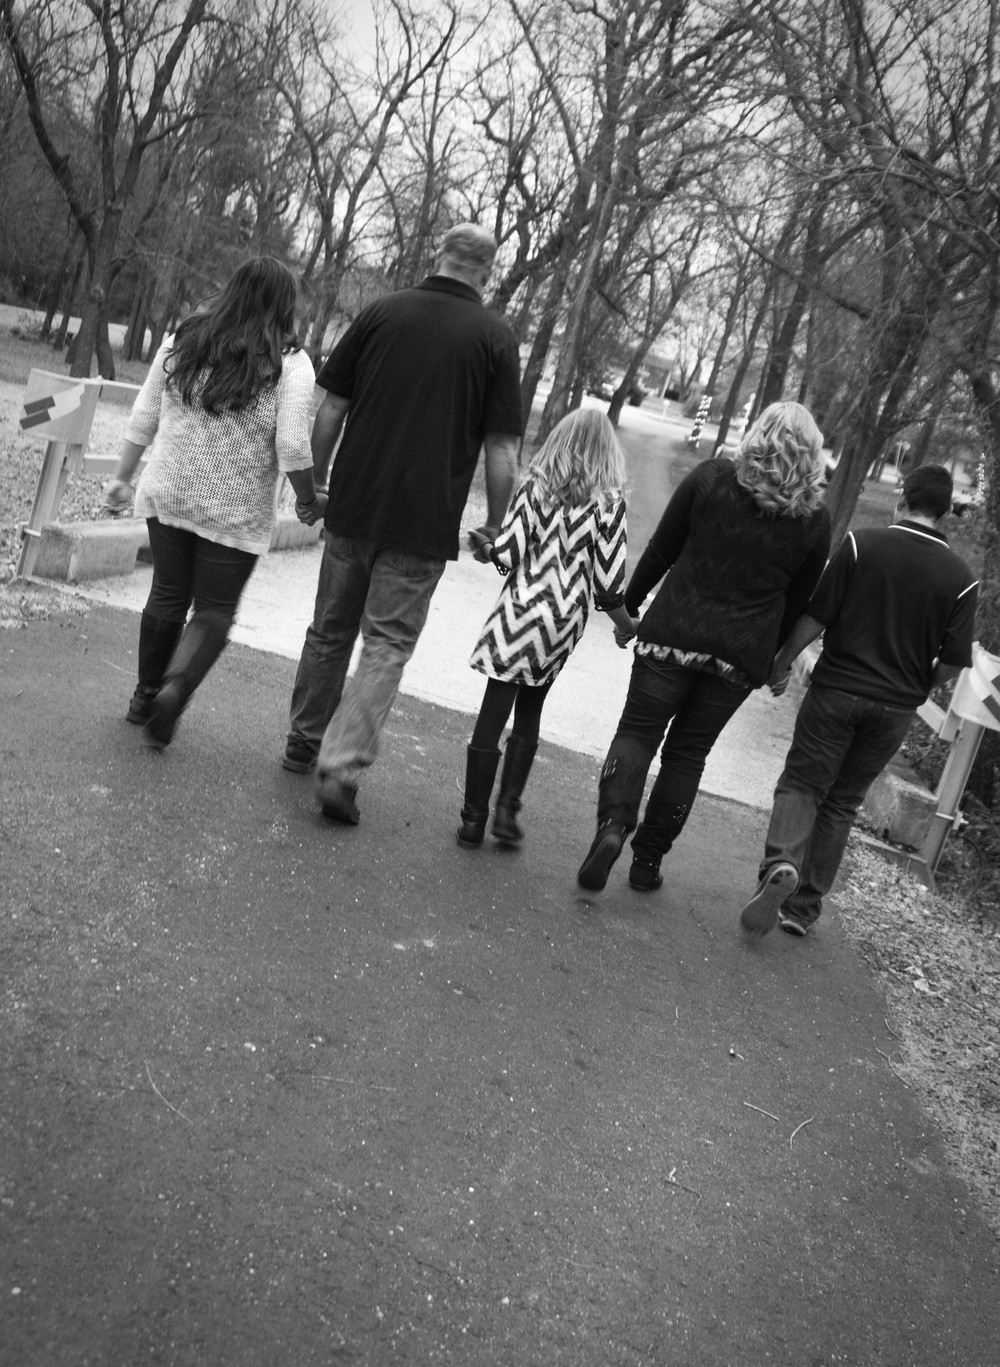 familyphotos-walkingaway-joplinmissouri-photosbyariel